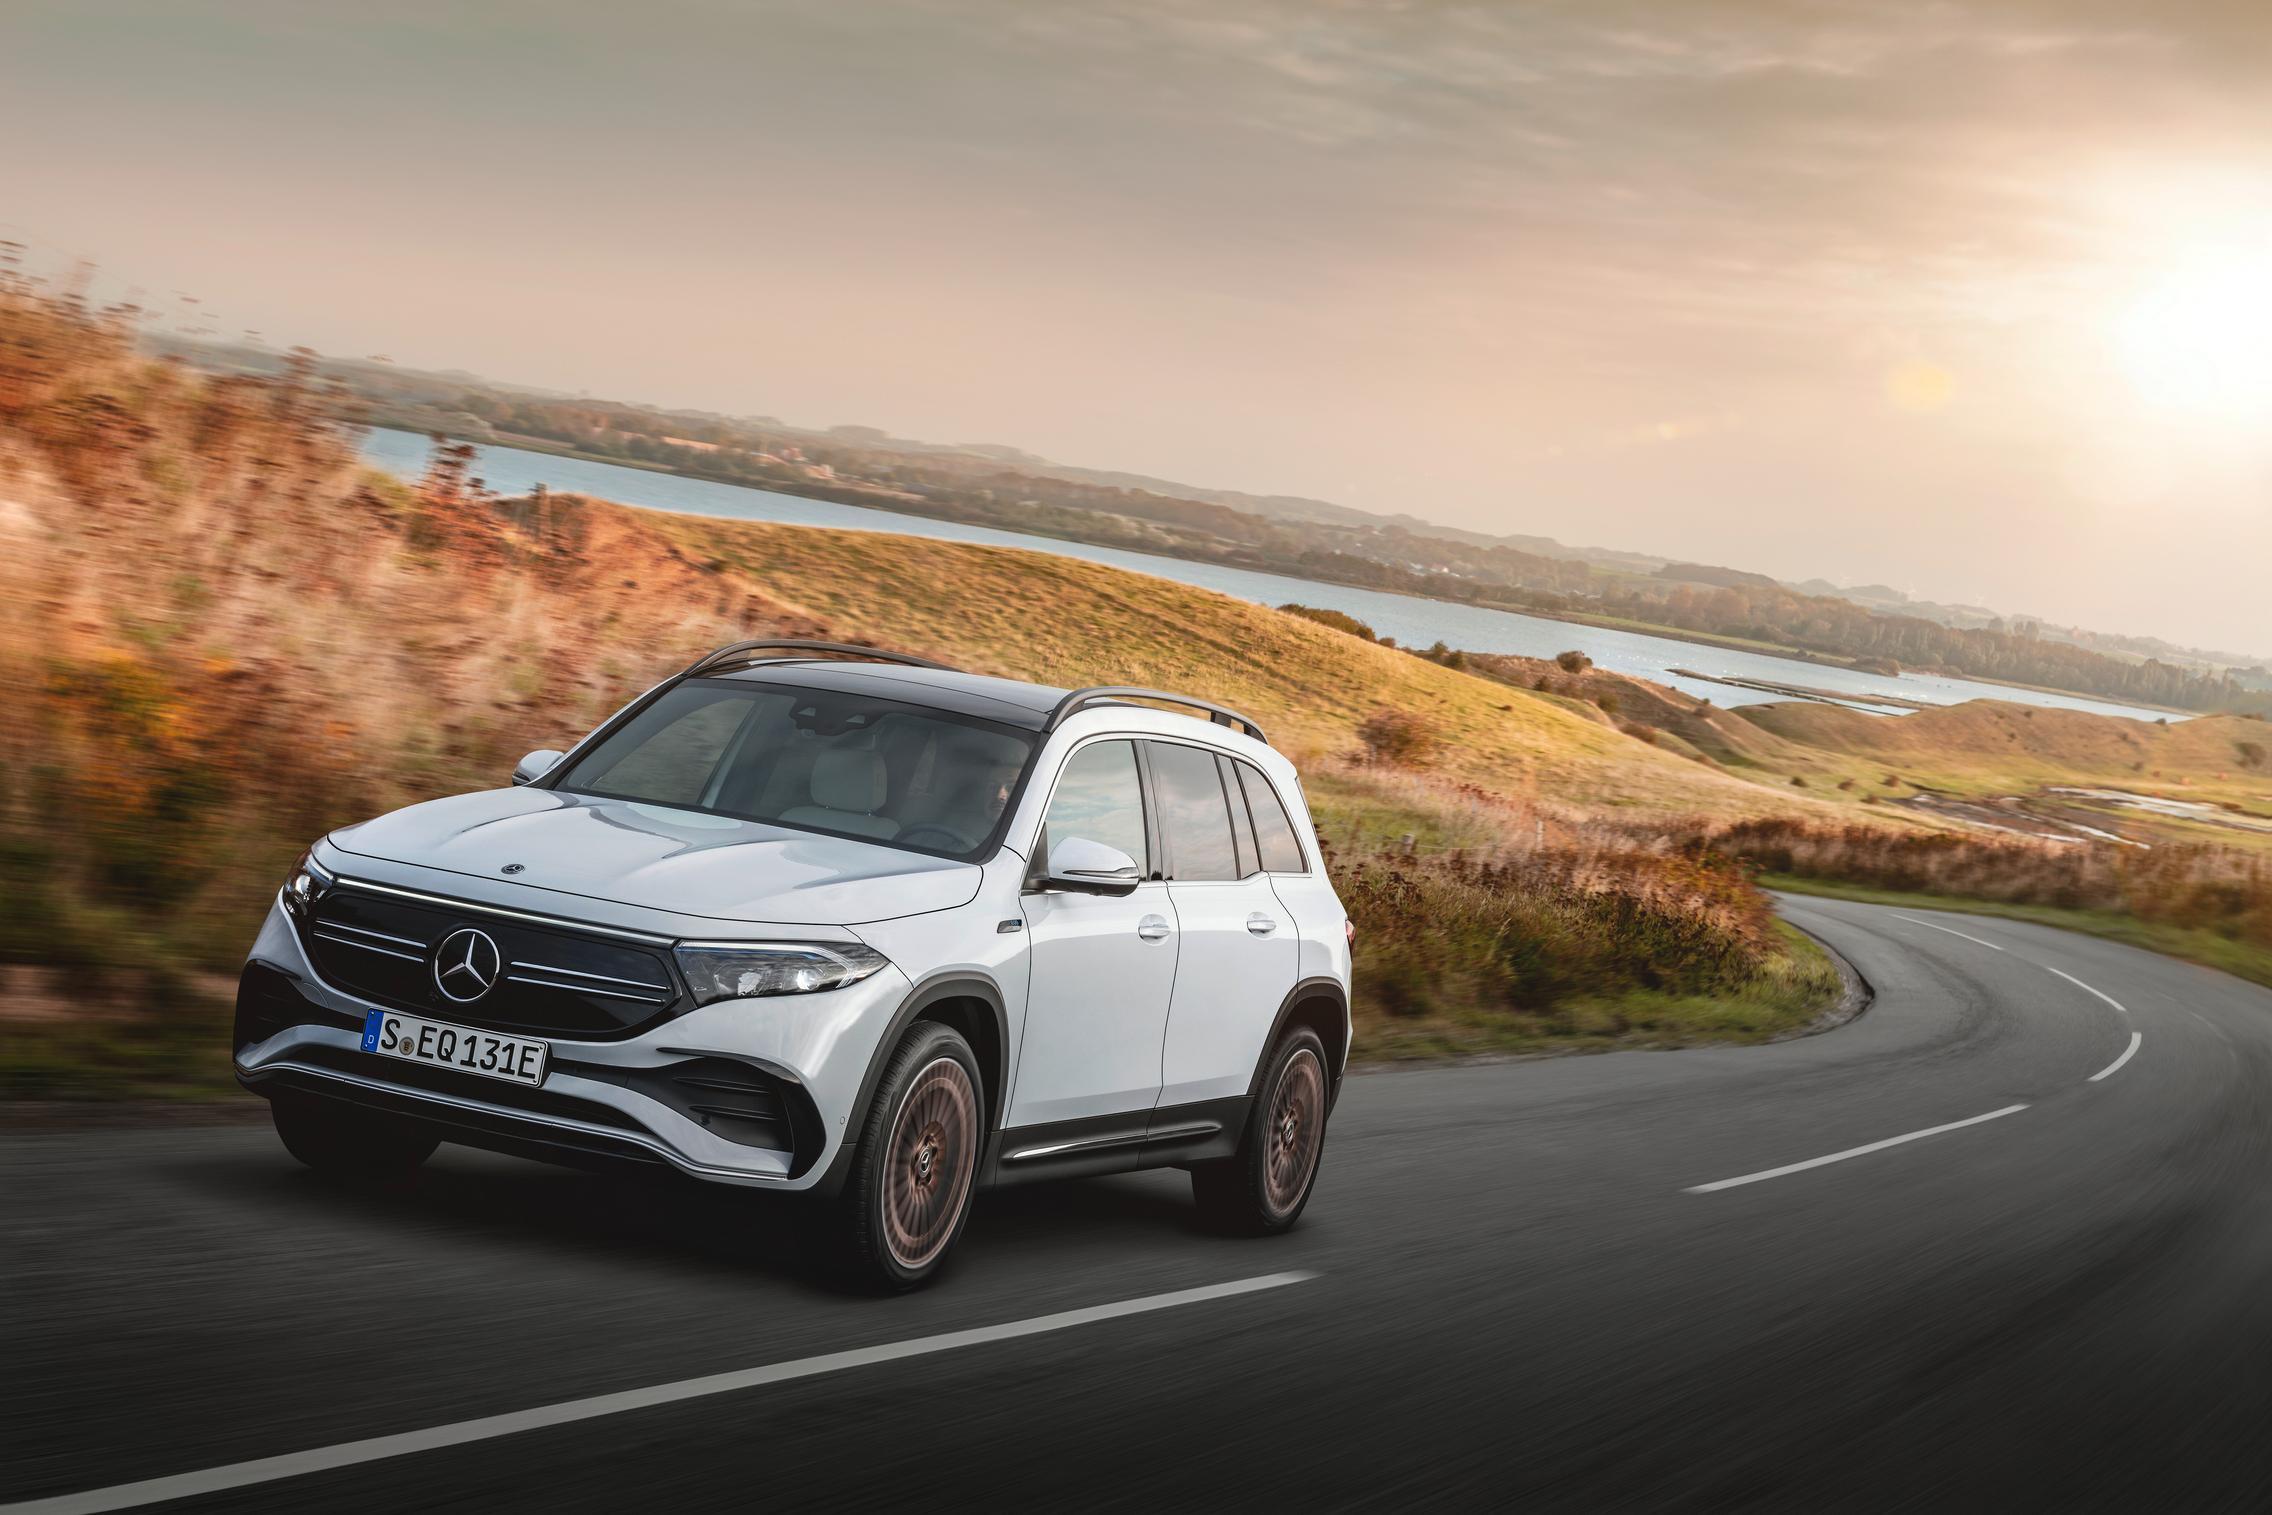 Digital White Mercedes-Benz EQB